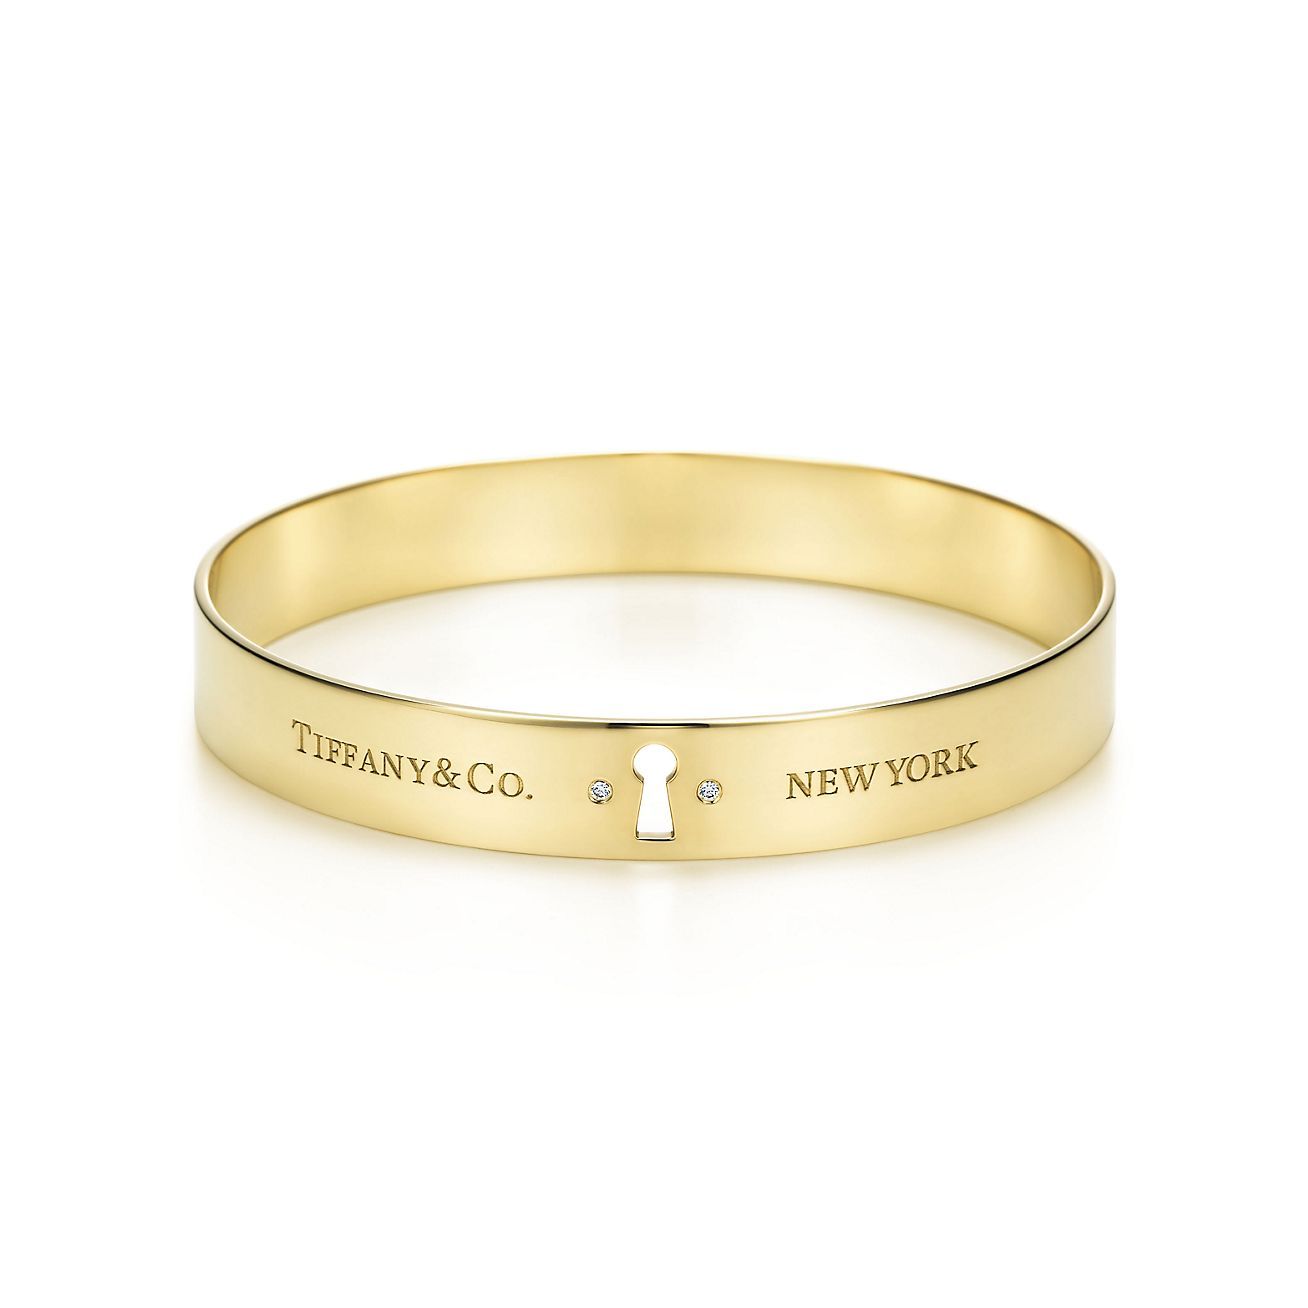 Tiffany Locks Bangle In 18k Gold With Diamonds, Medium. Purple Engagement Rings. Girlish Bracelet. Mini Stud Earrings. Pear Cut Wedding Rings. Pet Bracelet. 2ct Diamond. Red Diamond. Initial Lockets